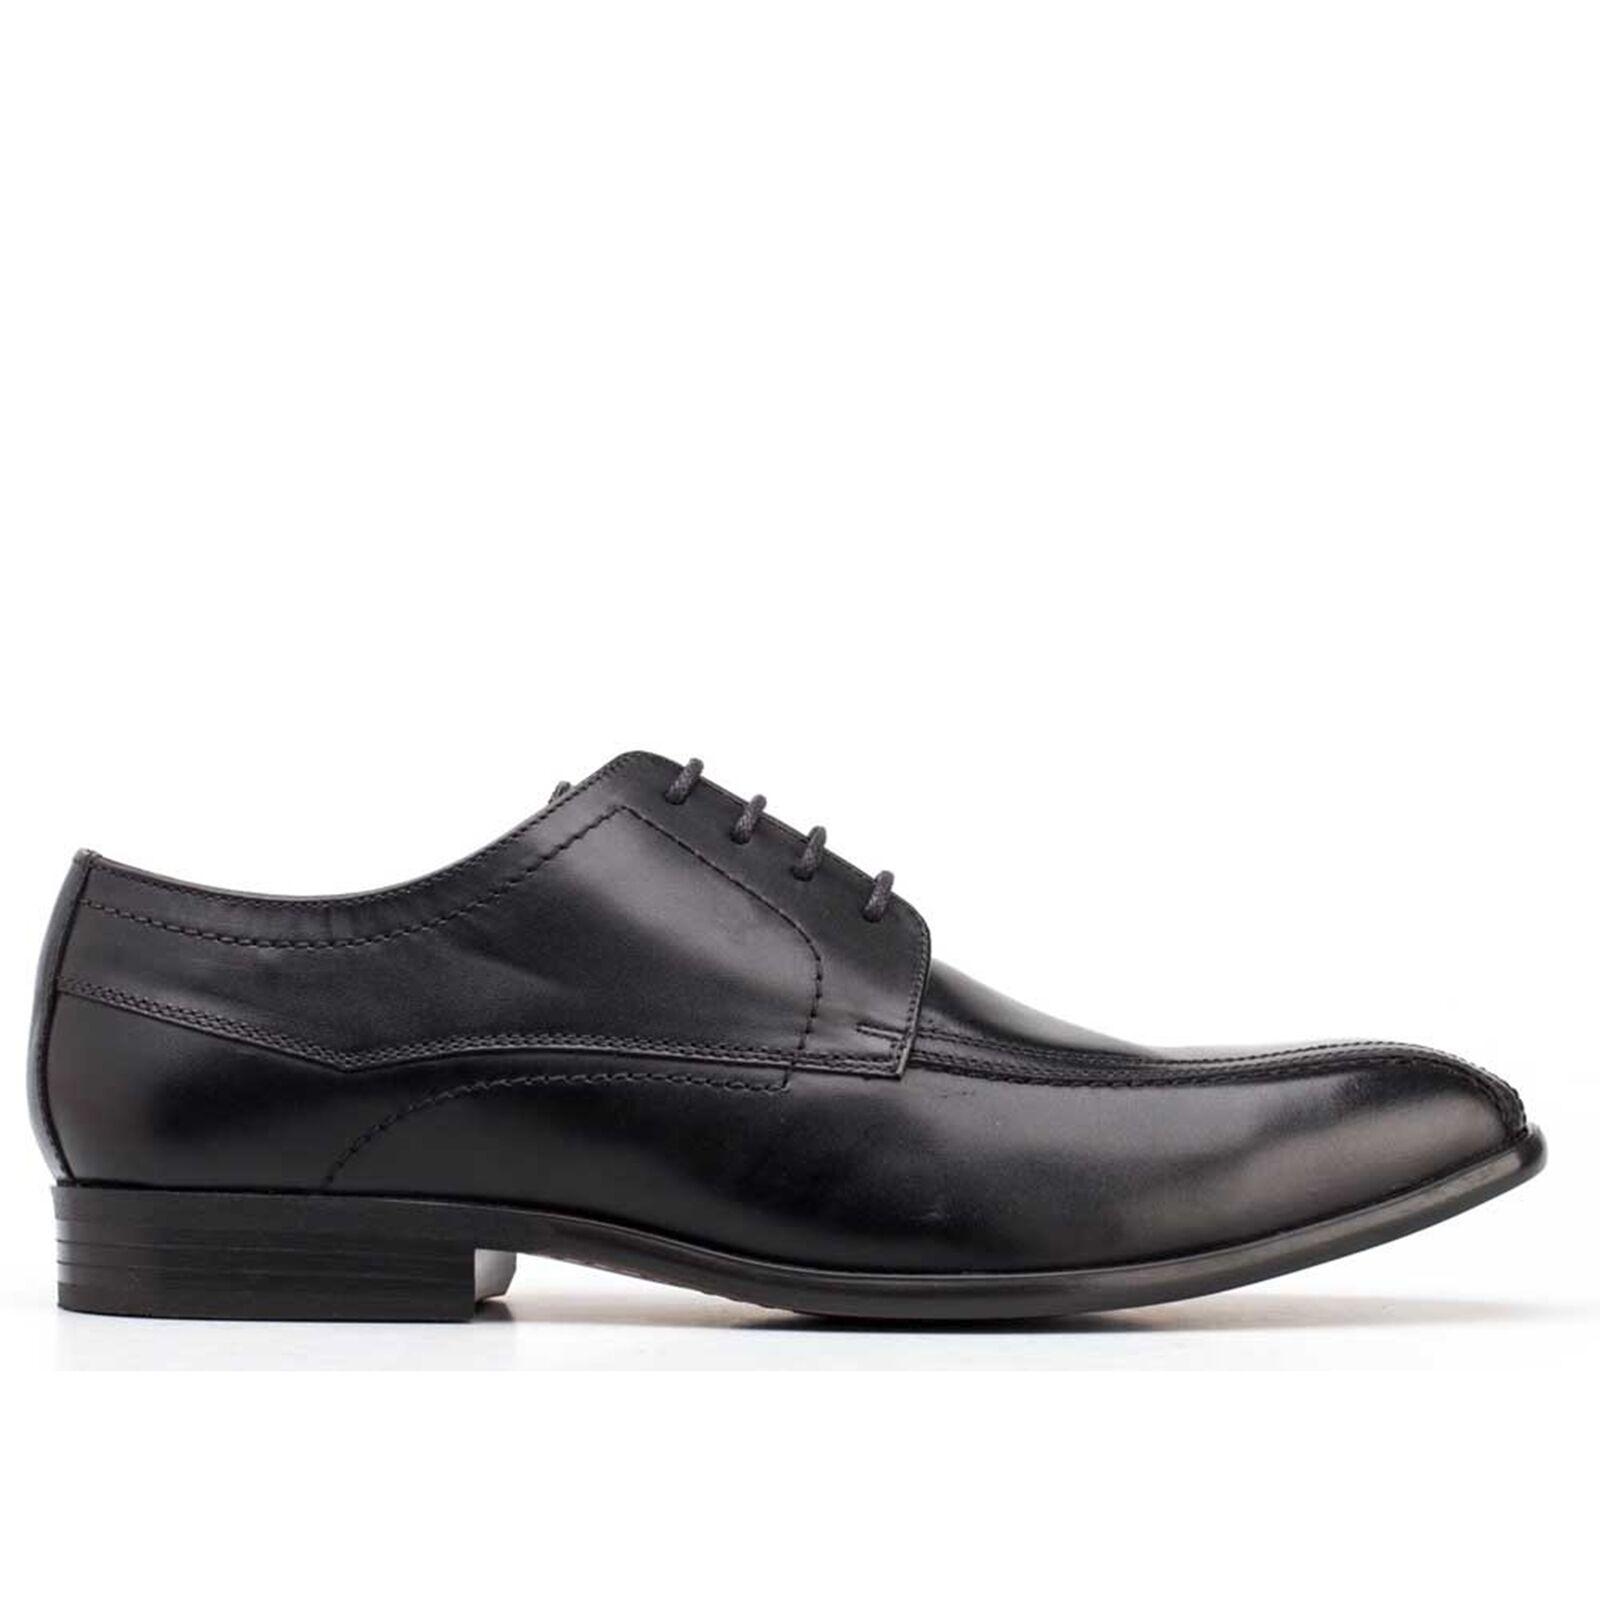 Base London Gilmore da uomo cerosa Pelle Stringati Formali Eleganti Scarpe Derby Nero